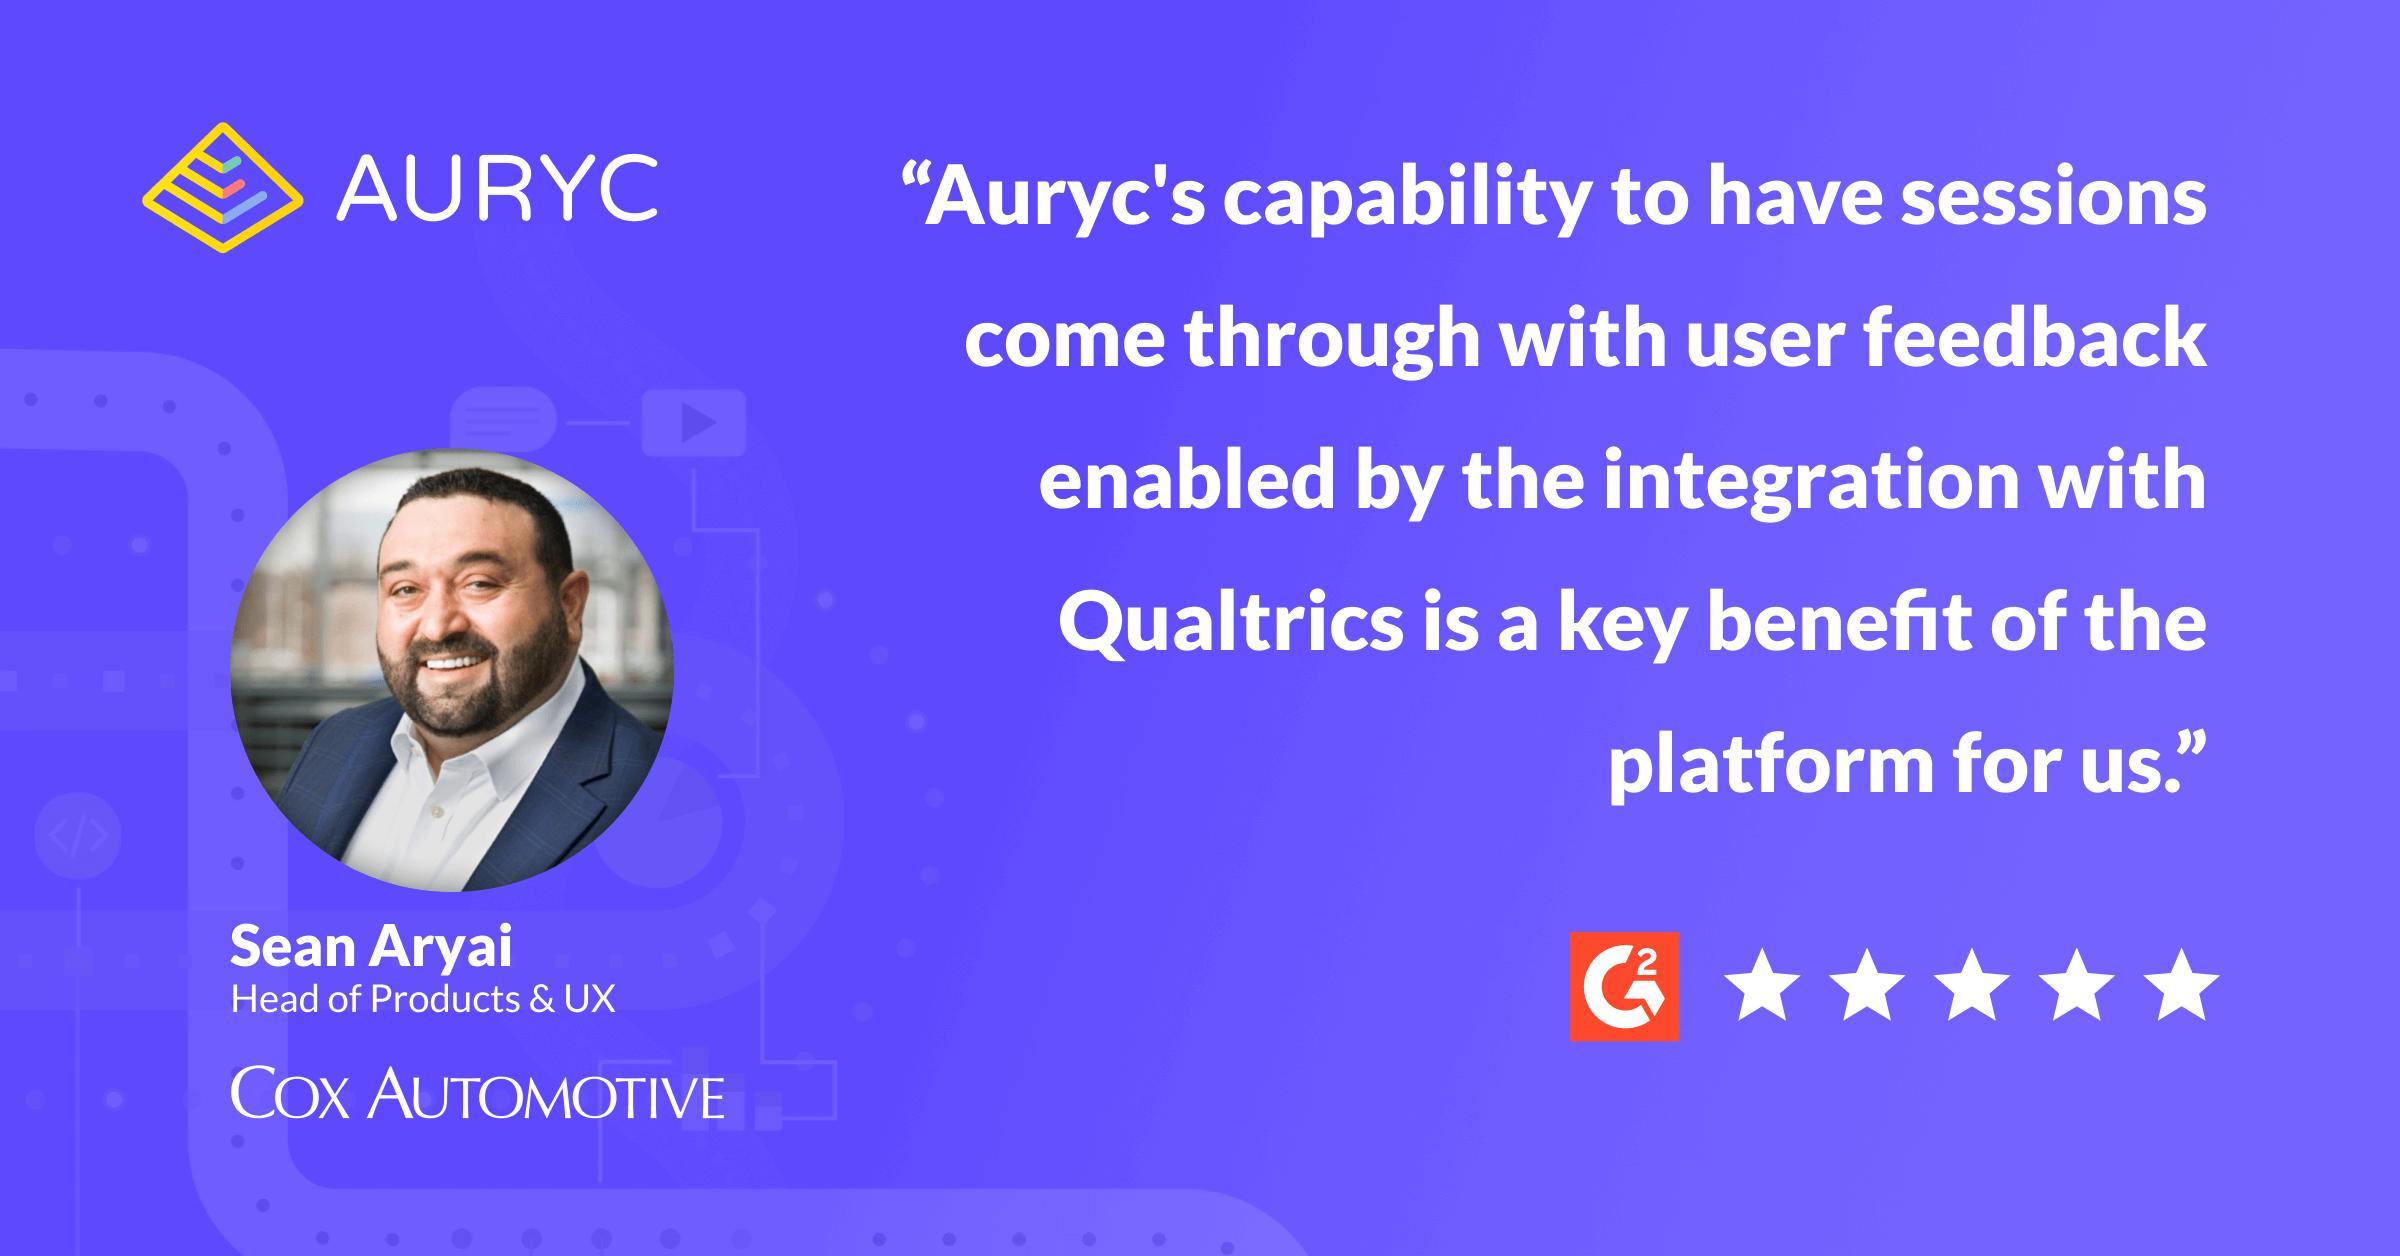 Auryc Review - Qualtrics Integration - Sean Aryai - Qualtrics Integration Key Value